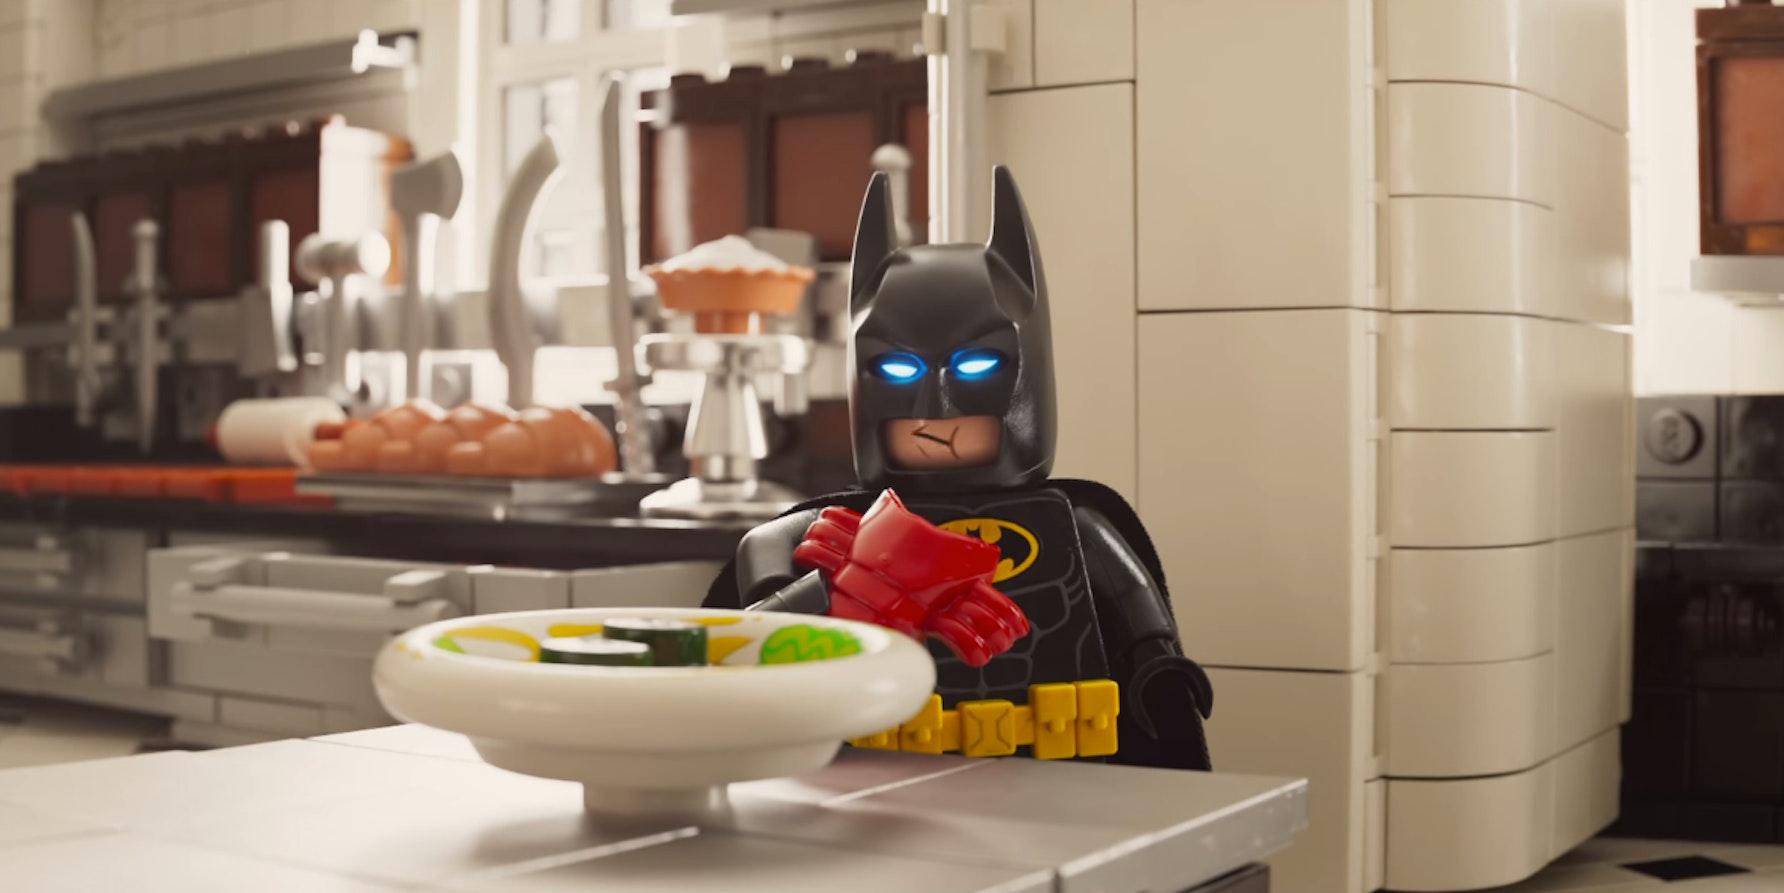 DC Scored a Home Run by Making Batman Funny Again